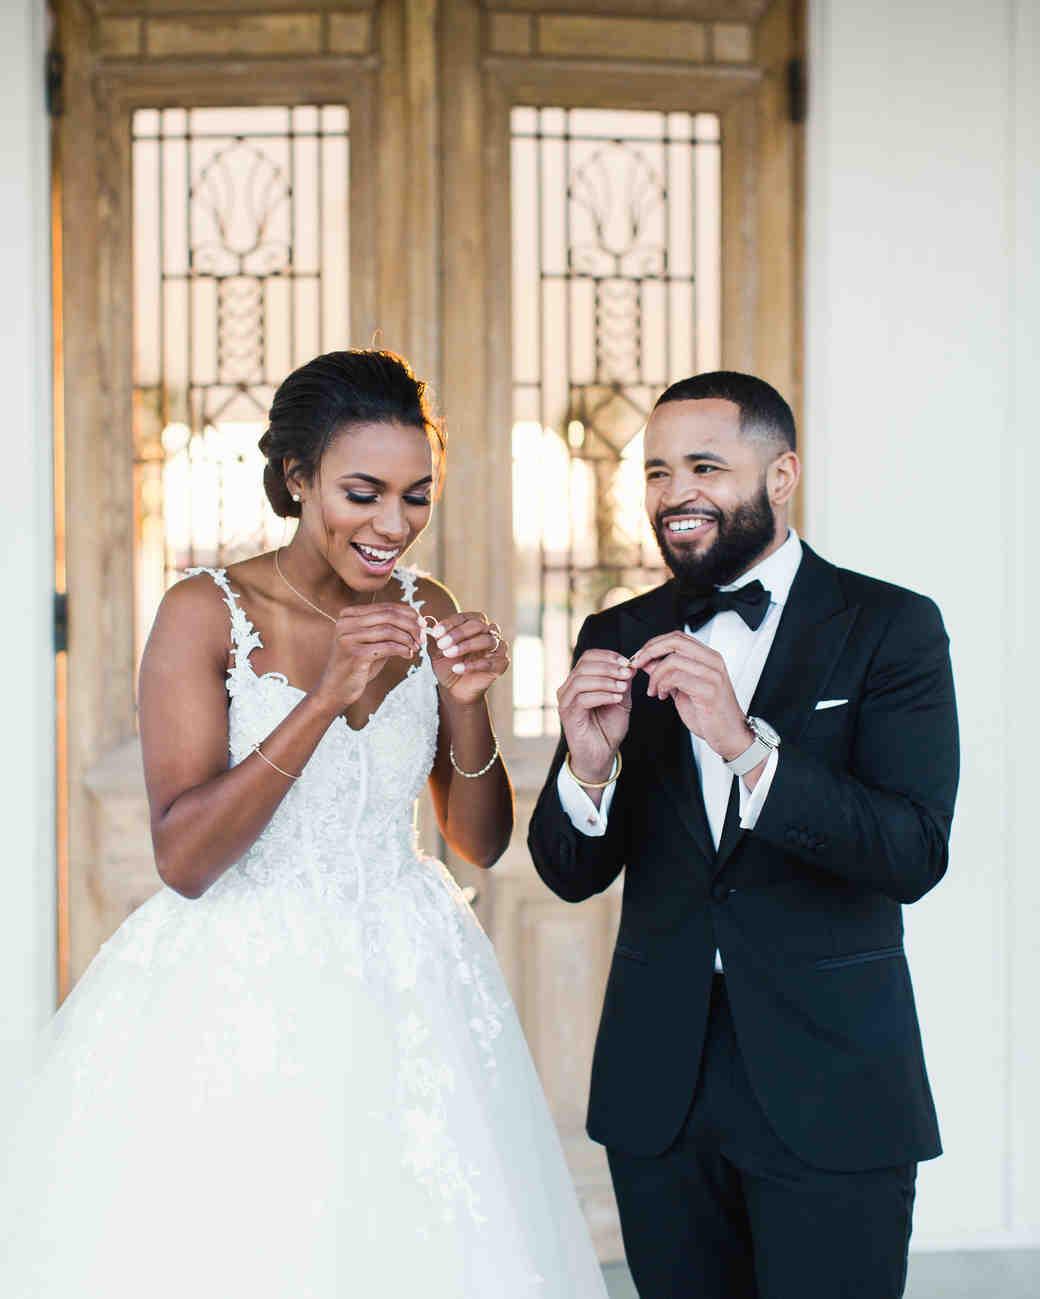 wedding couple looking at wedding rings